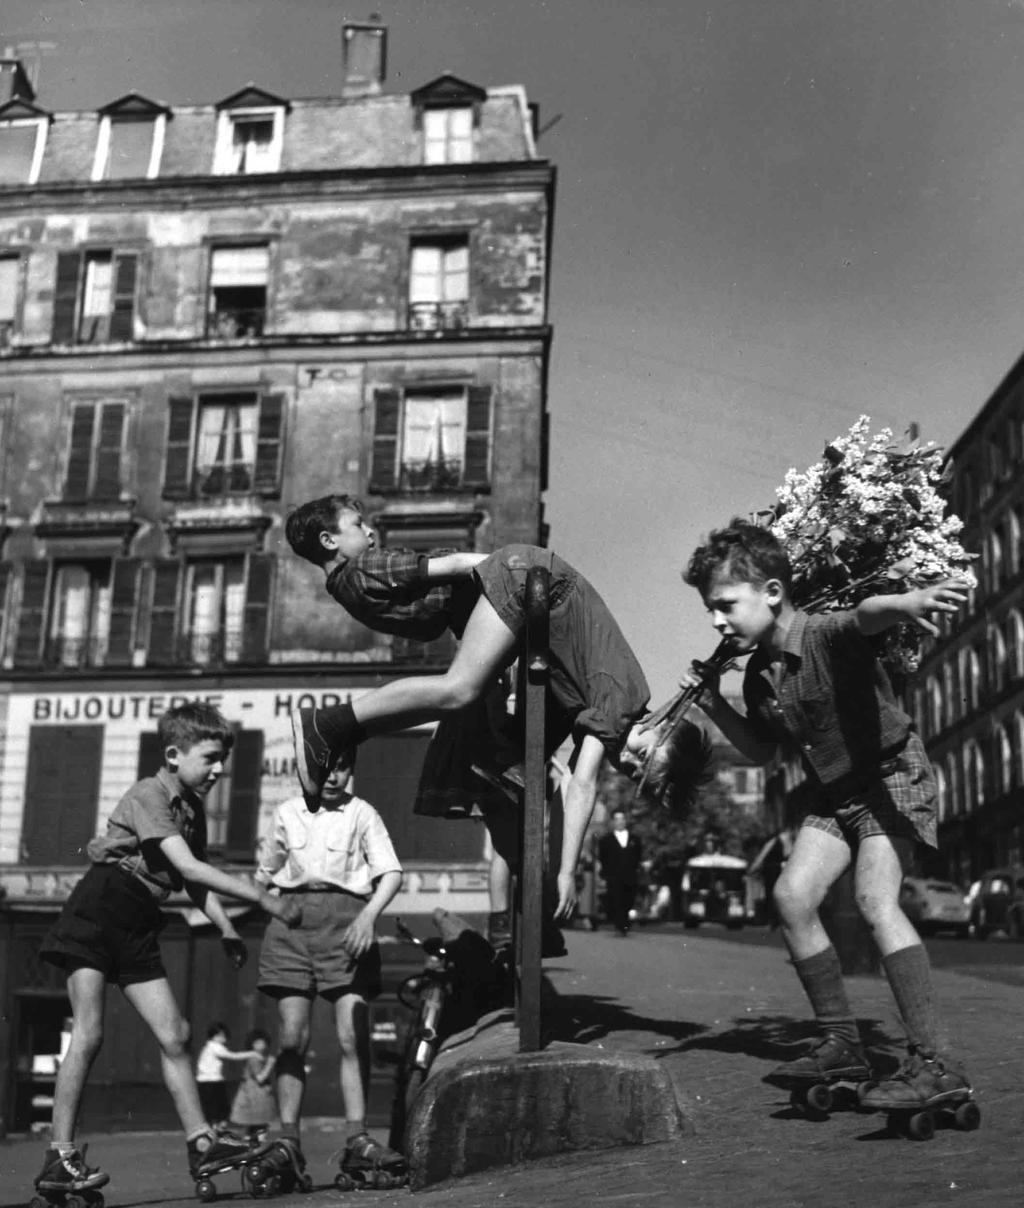 Robert Doisneau  Enfants Annees 1950-323-1 by hosagu